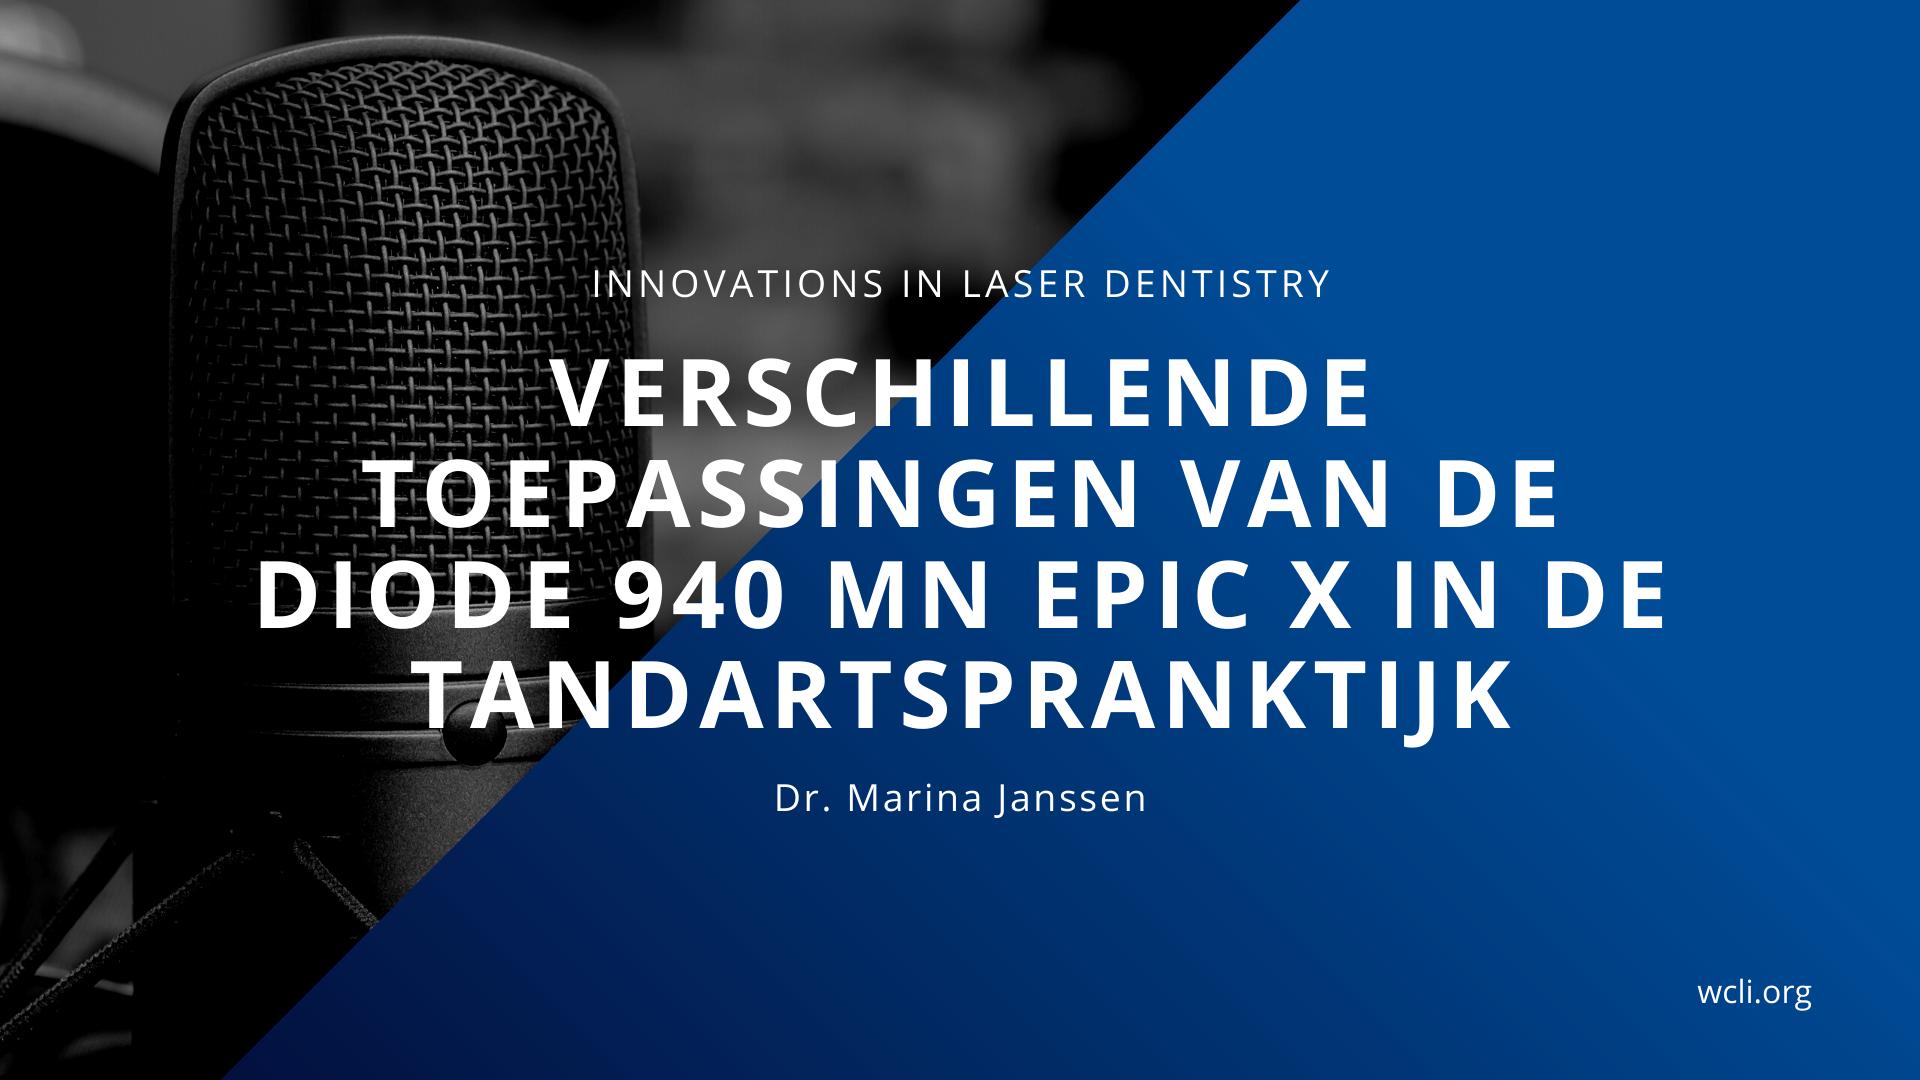 webinar-cover- Dr. Marina Janssen